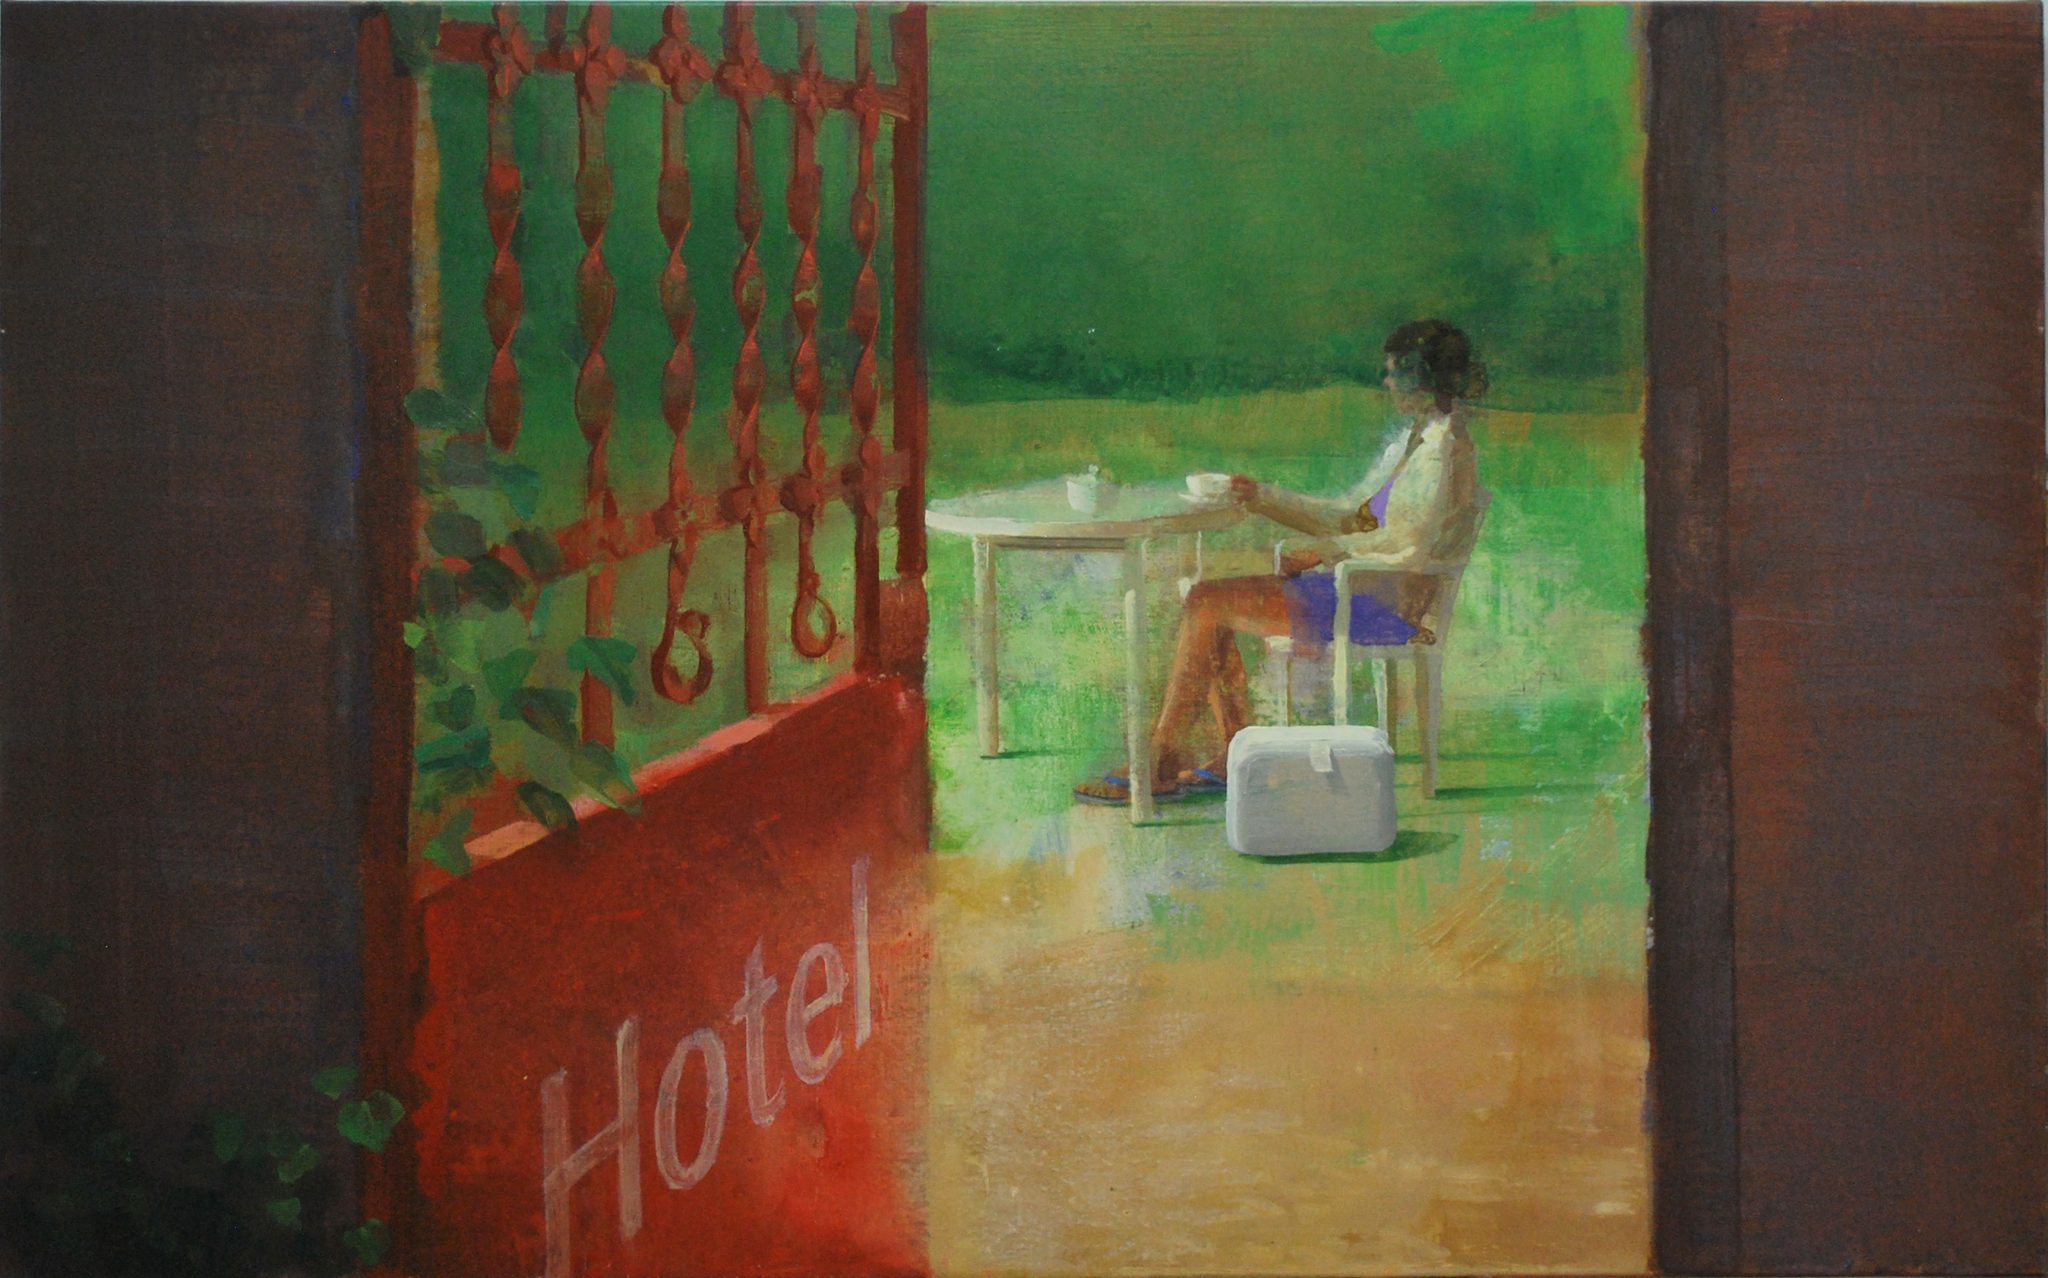 hotel-viaje-alejandra-caballero-oleo-mujer-tomando-maleta-puerta-abierta